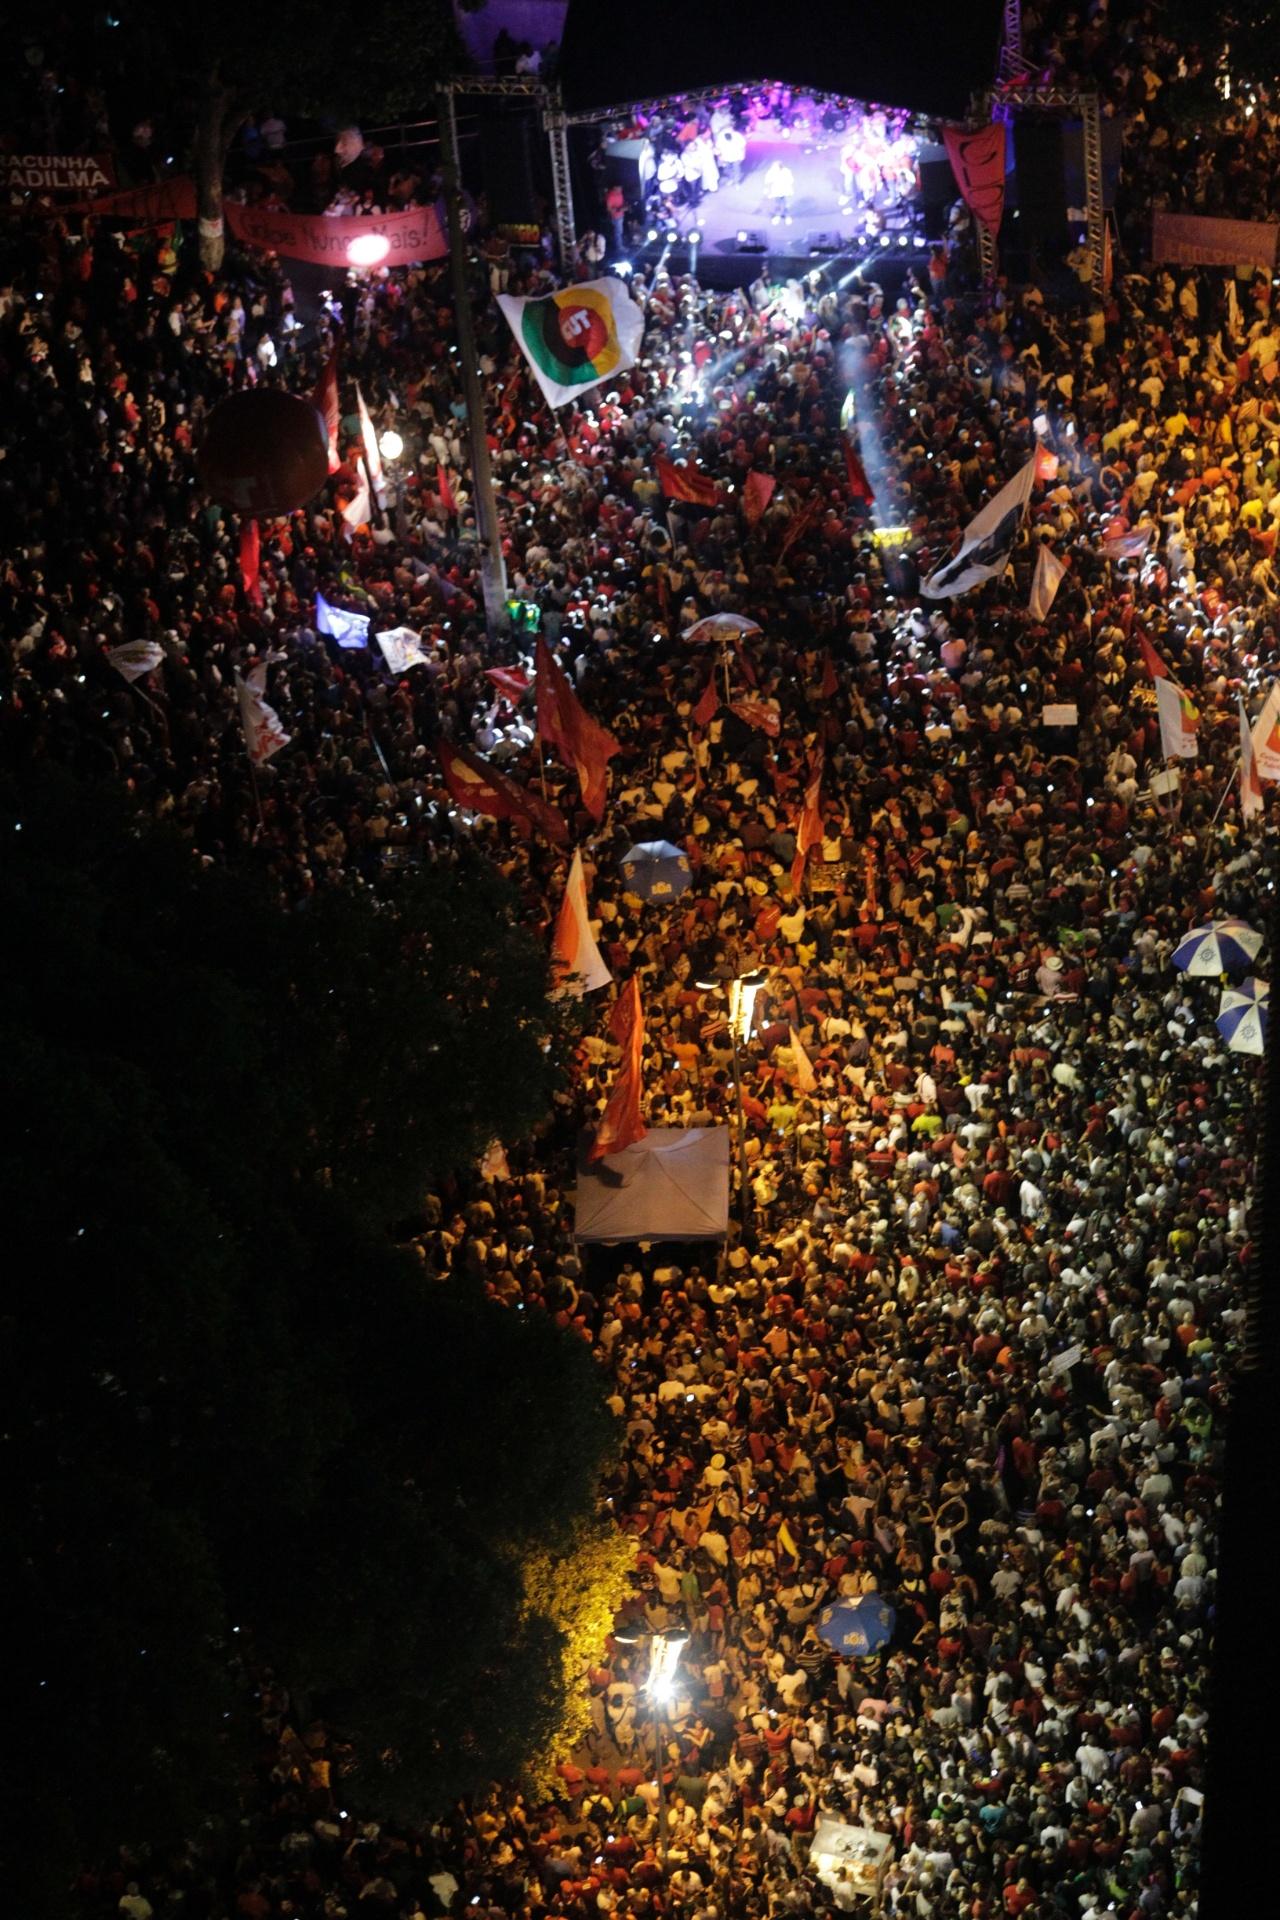 18.mar.2016 - No Rio de Janeiro, manifestantes promovem ato anti-impeachment da presidente Dilma Rousseff e a favor da democracia na Cinelândia